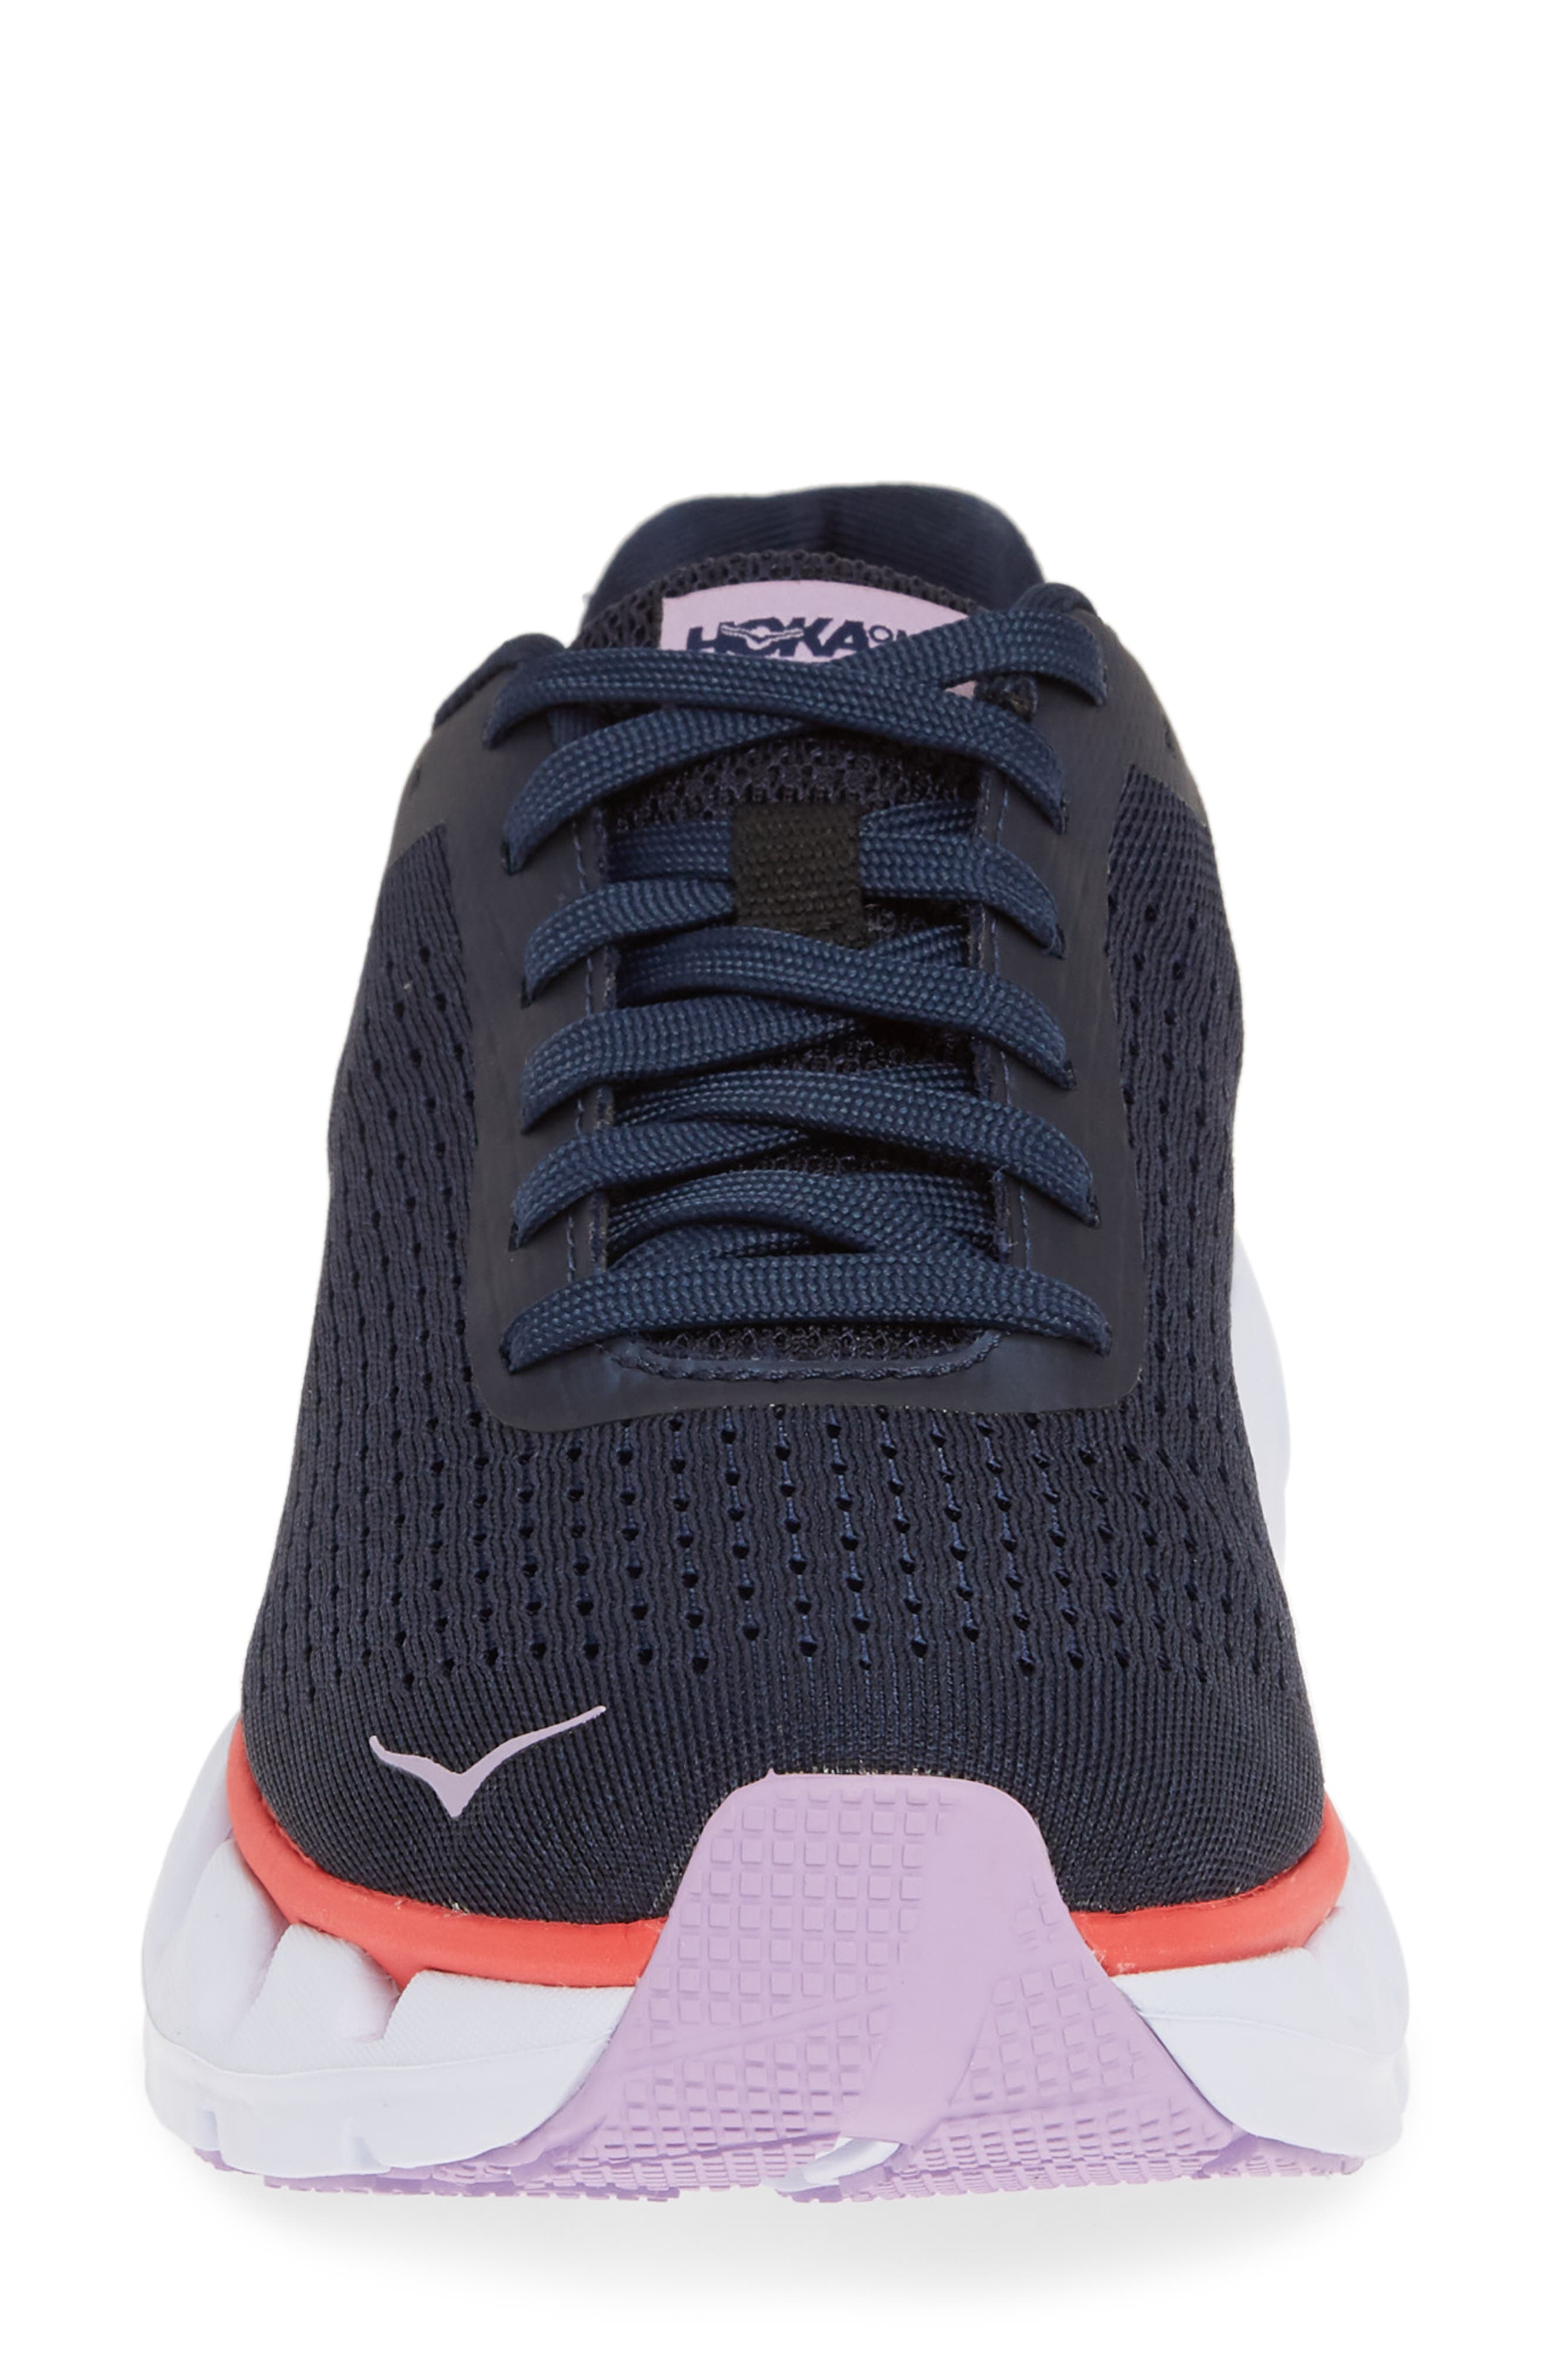 Elevon Running Shoe,                             Alternate thumbnail 4, color,                             001